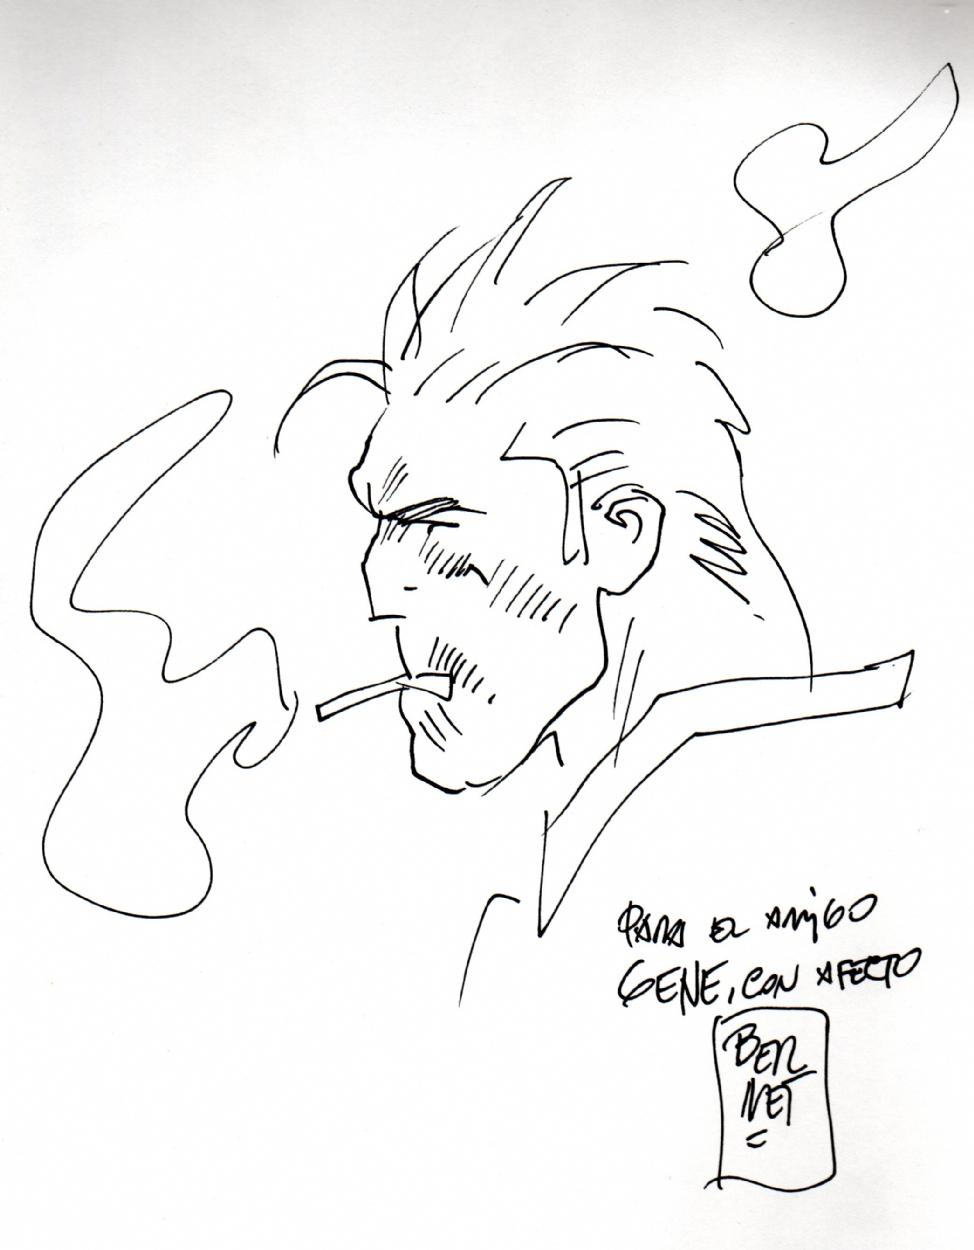 974x1250 Torpedo Sketch By Jordi Bernet, In Gene Poonyo's Ex Libris Comic